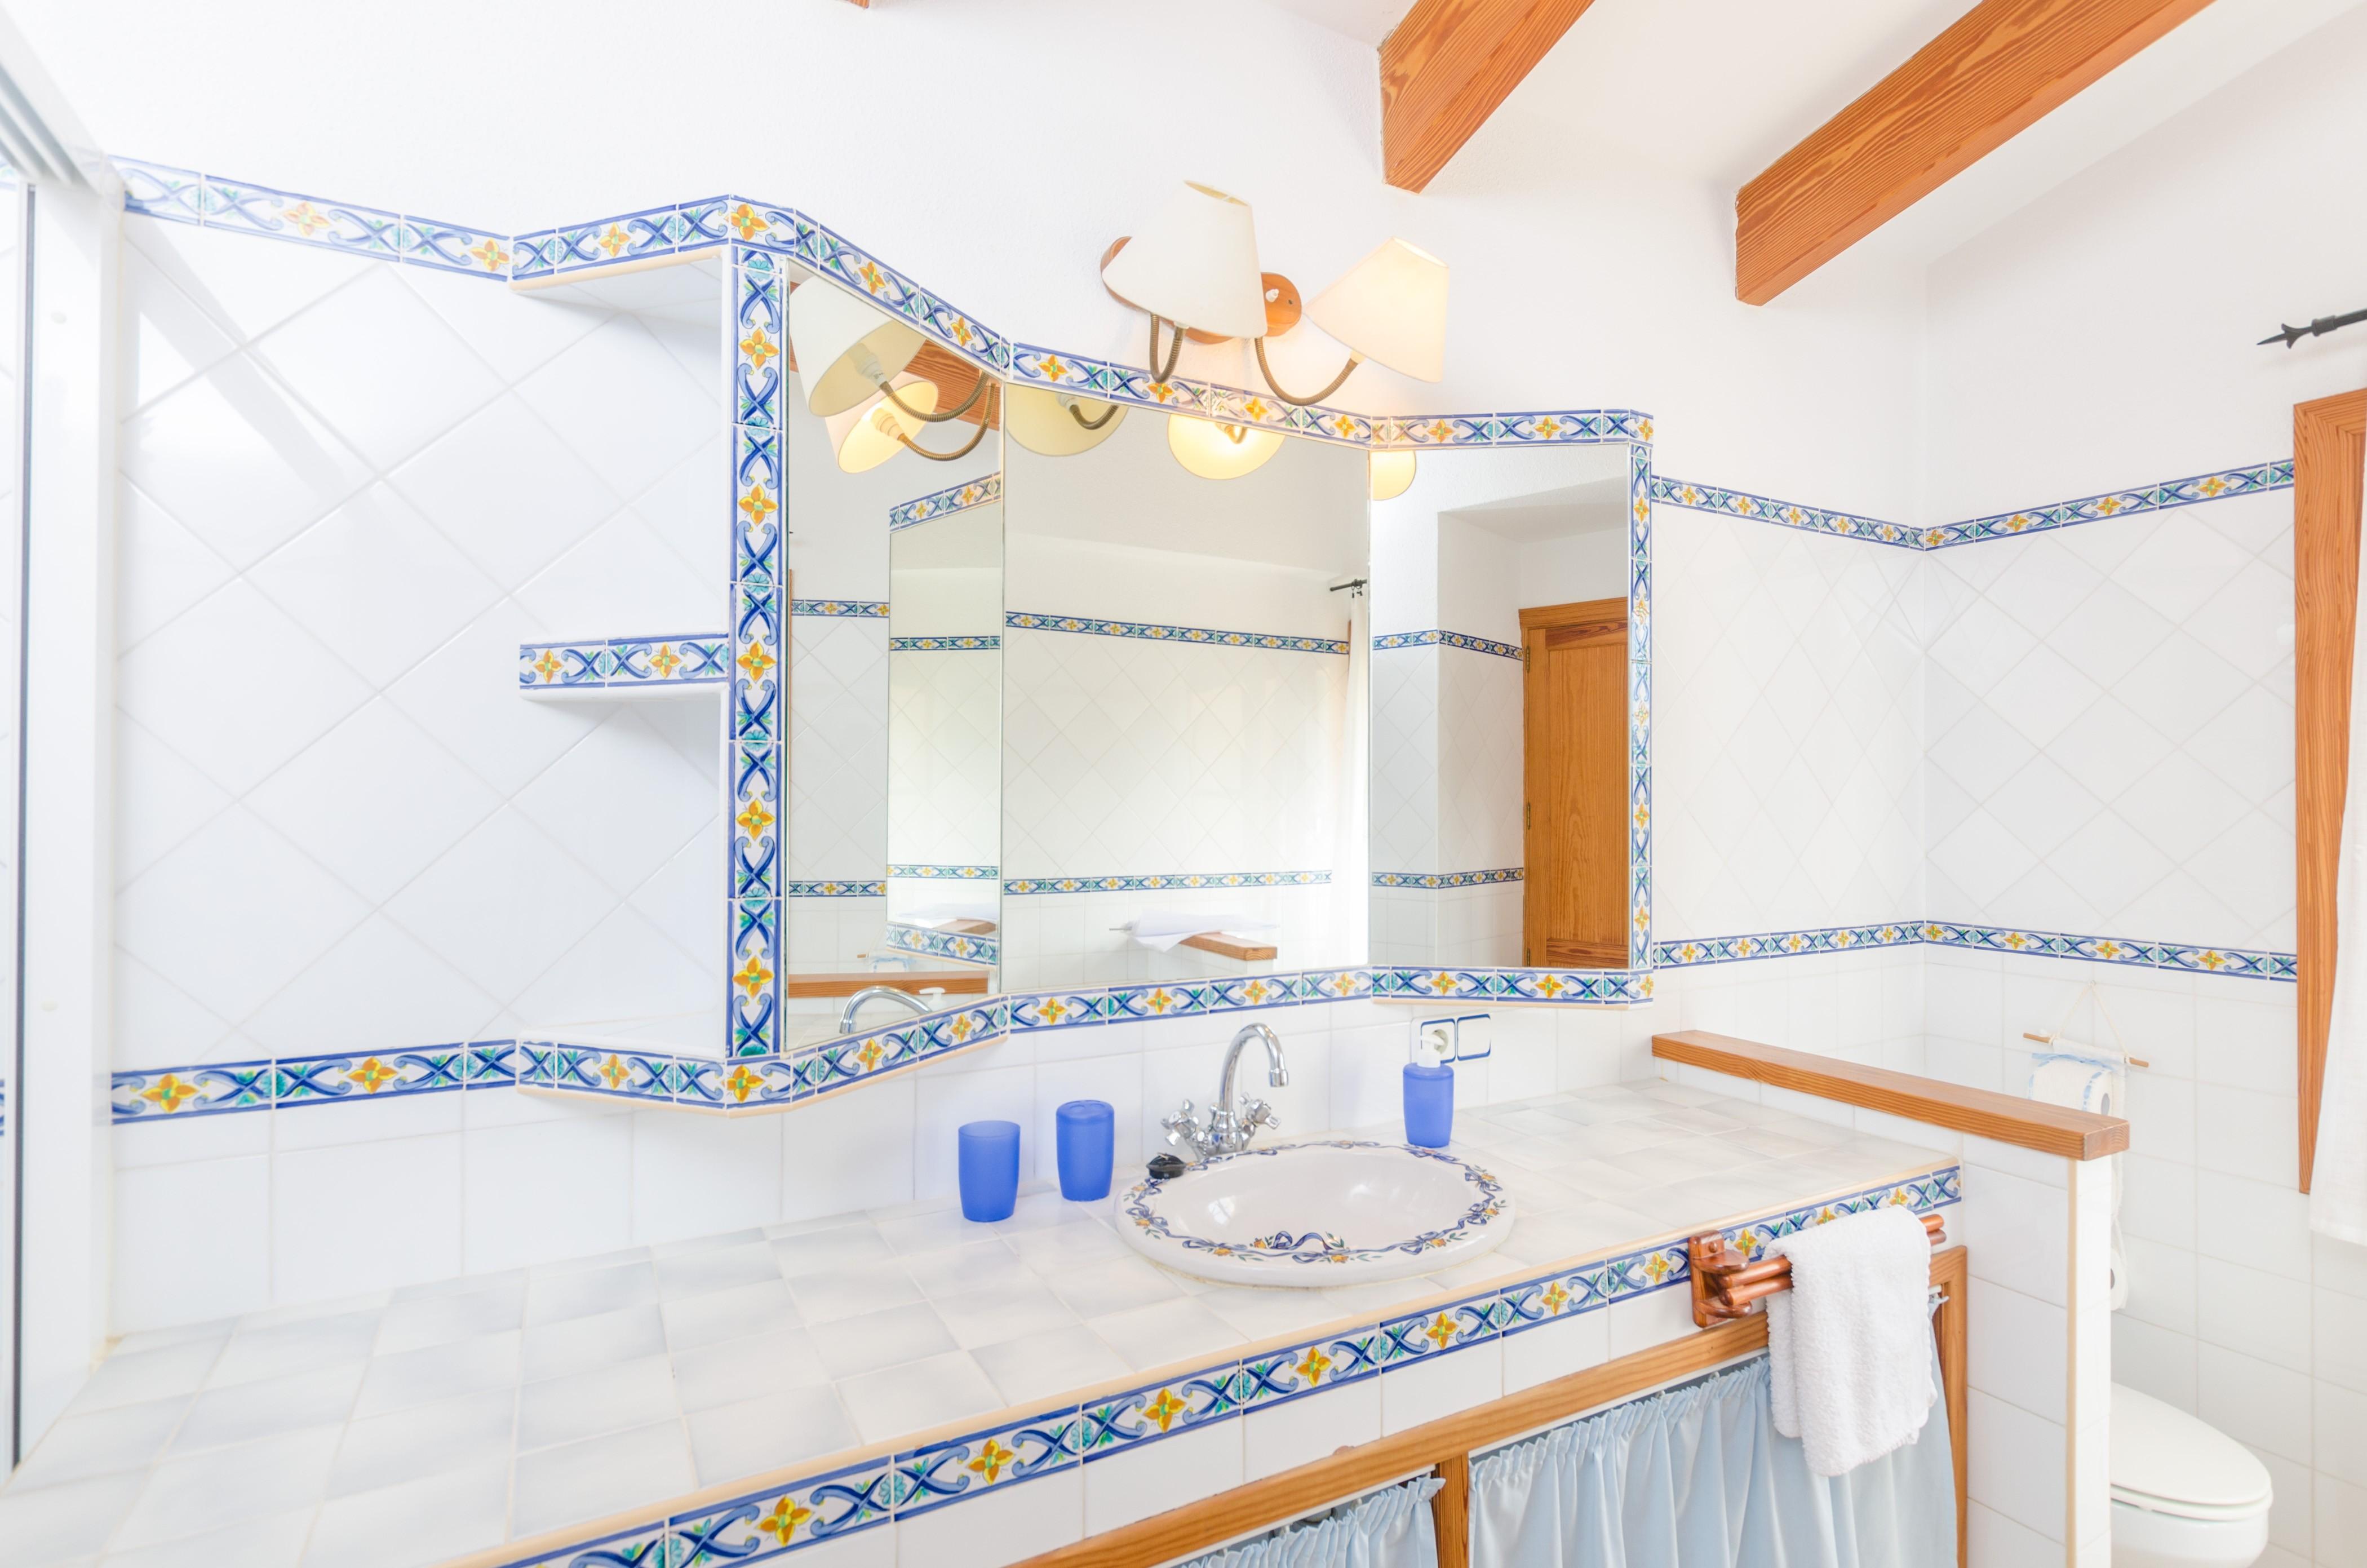 Maison de vacances SA SINIA (2374876), Lloret de Vistalegre, Majorque, Iles Baléares, Espagne, image 24